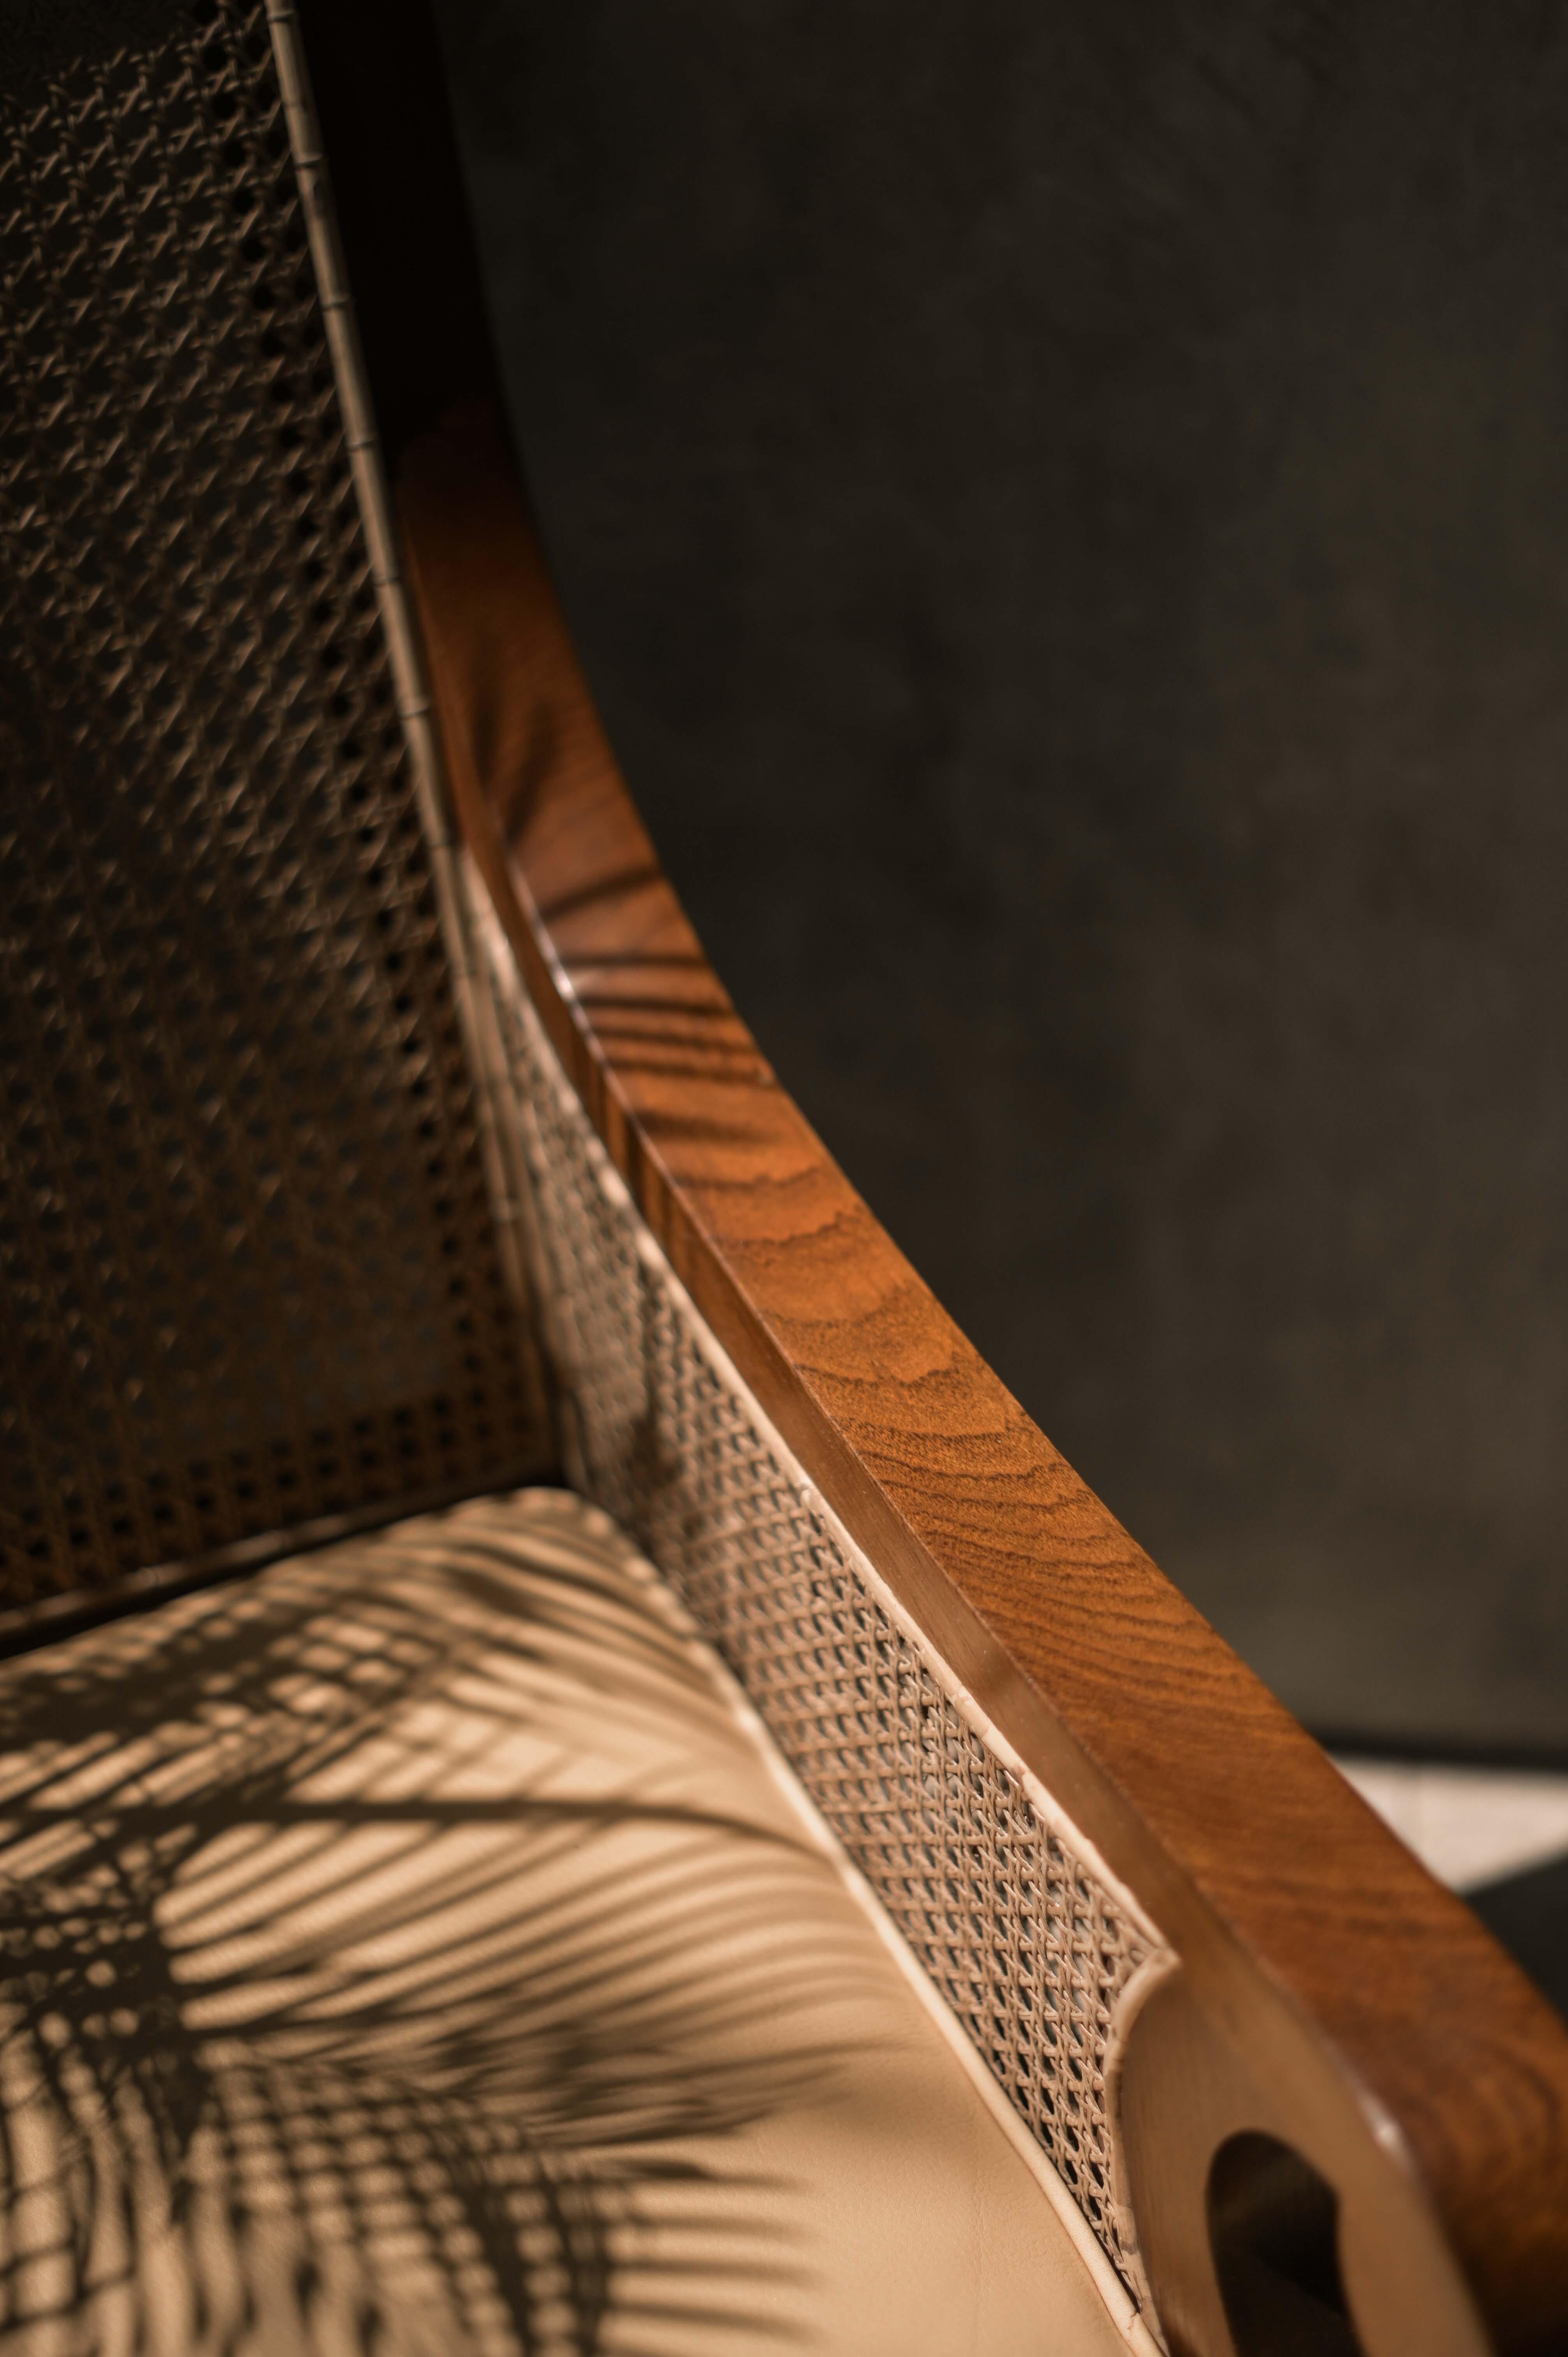 bamboo rattan teak wood furniture armchair